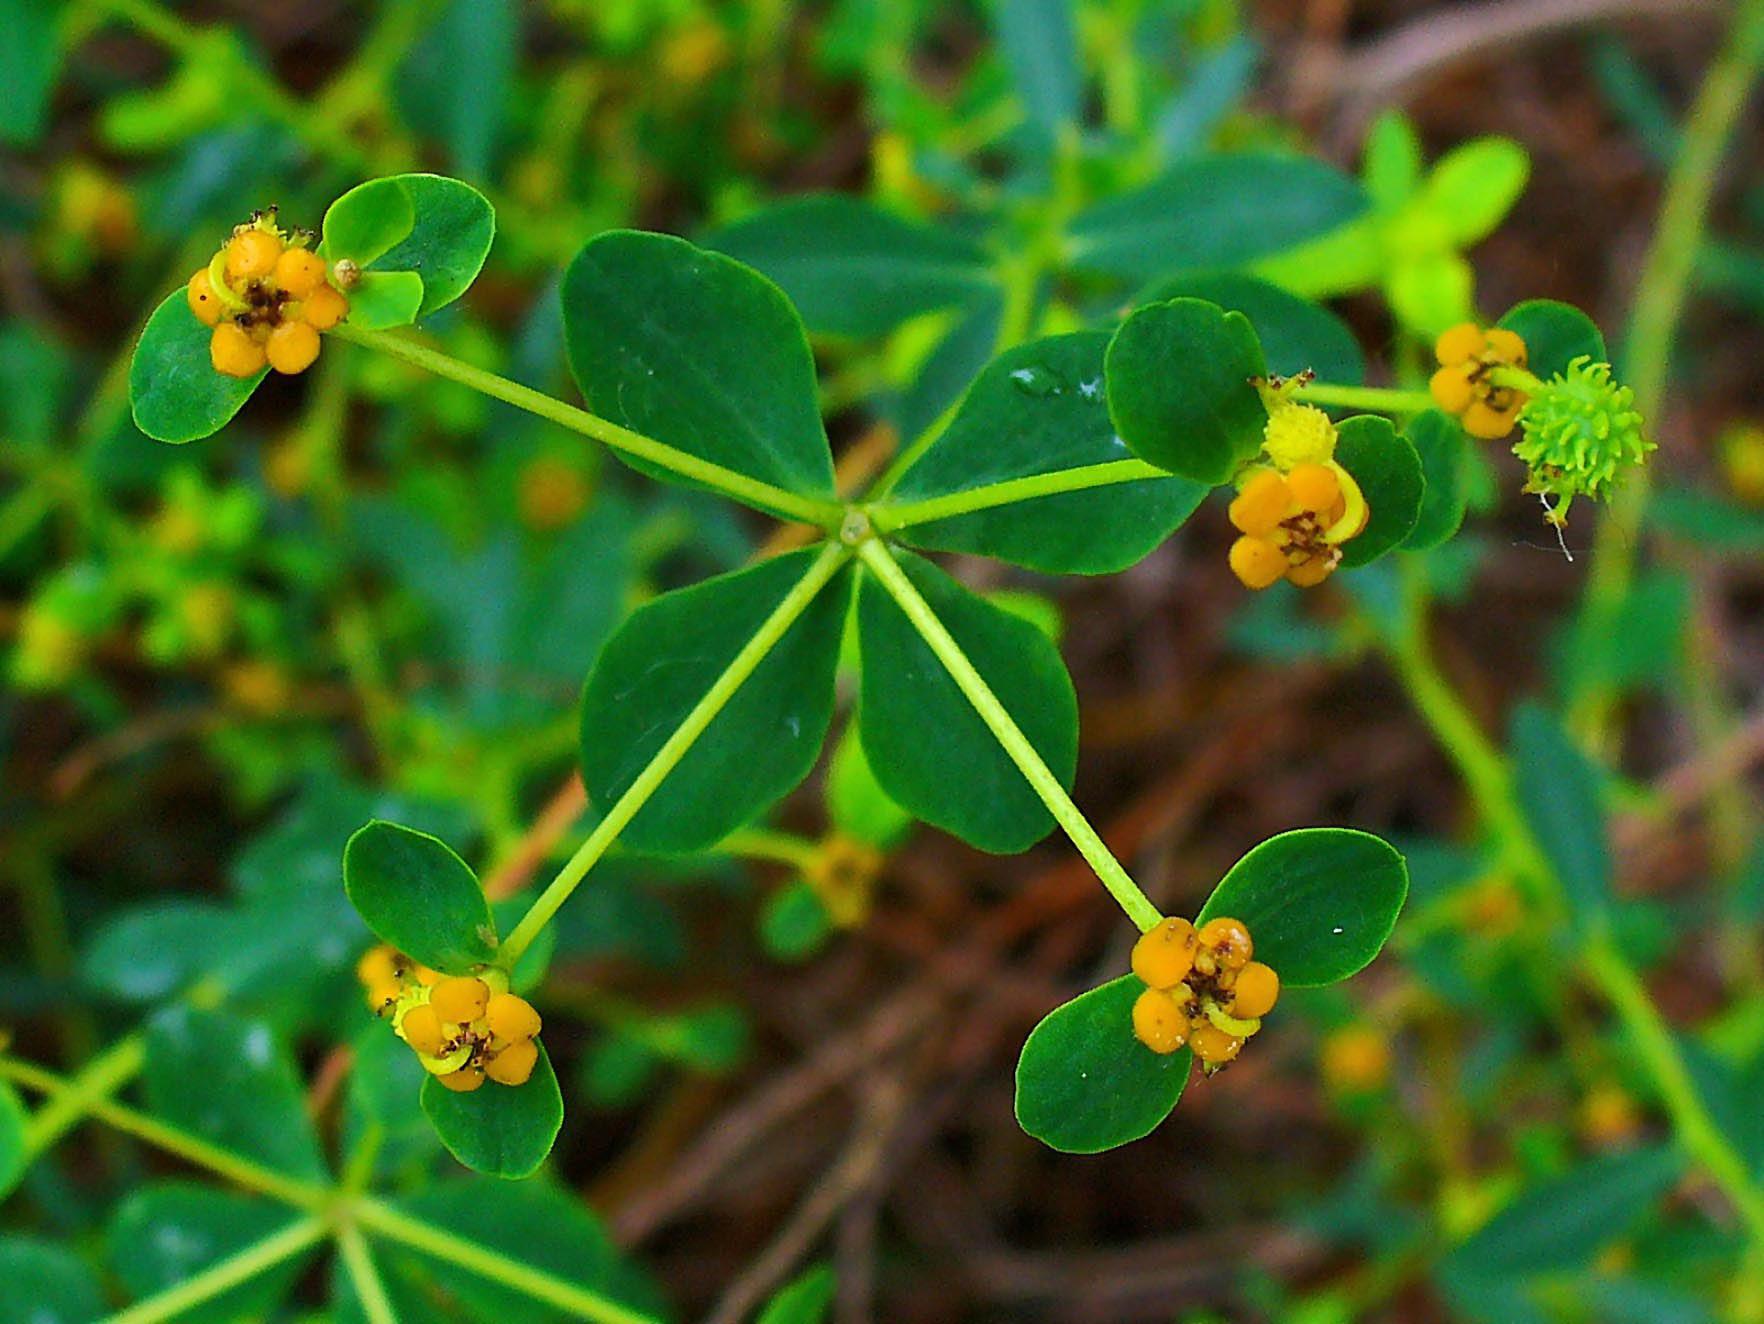 File:Euphorbia spinosa 002.JPG - Wikimedia Commons